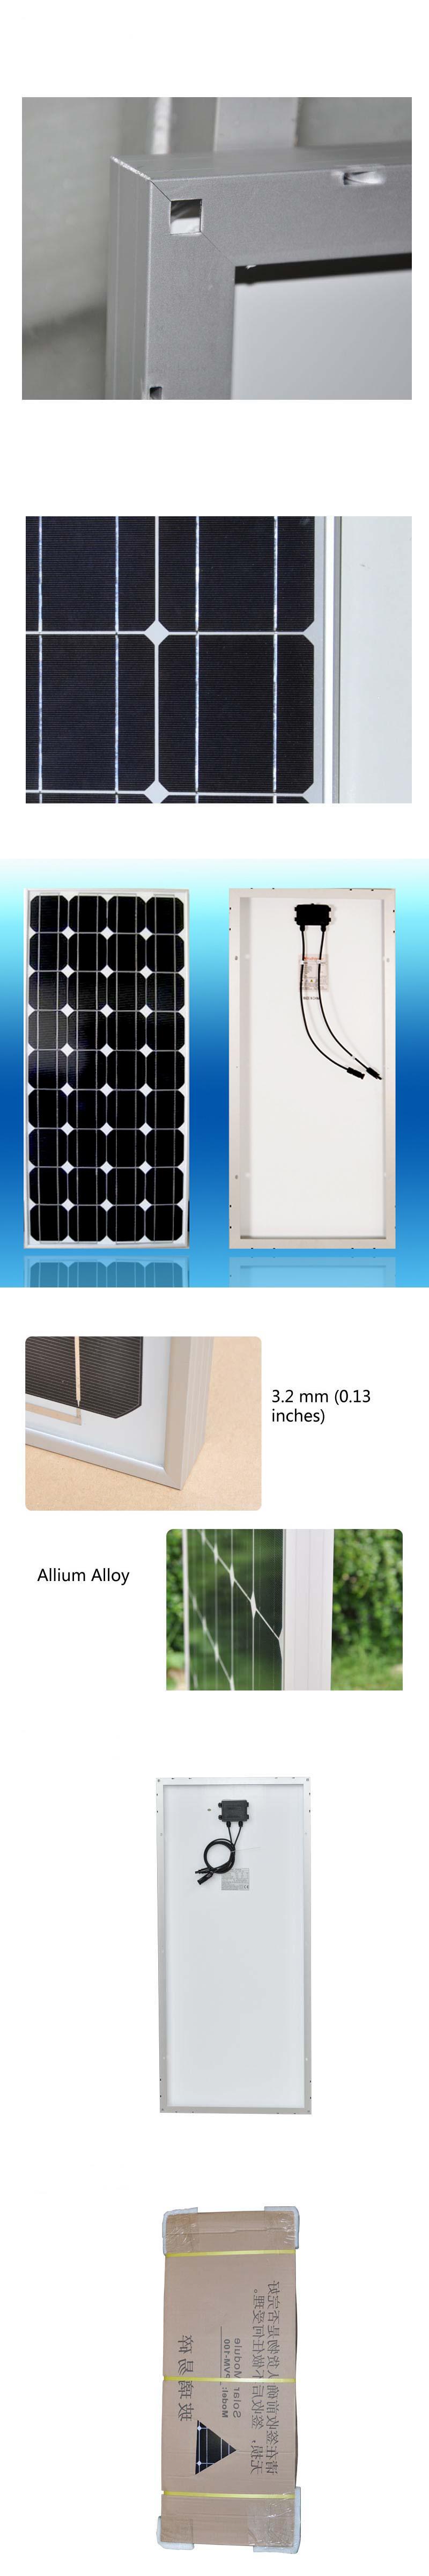 portable solar panel module 100w camping car 12v solar battery